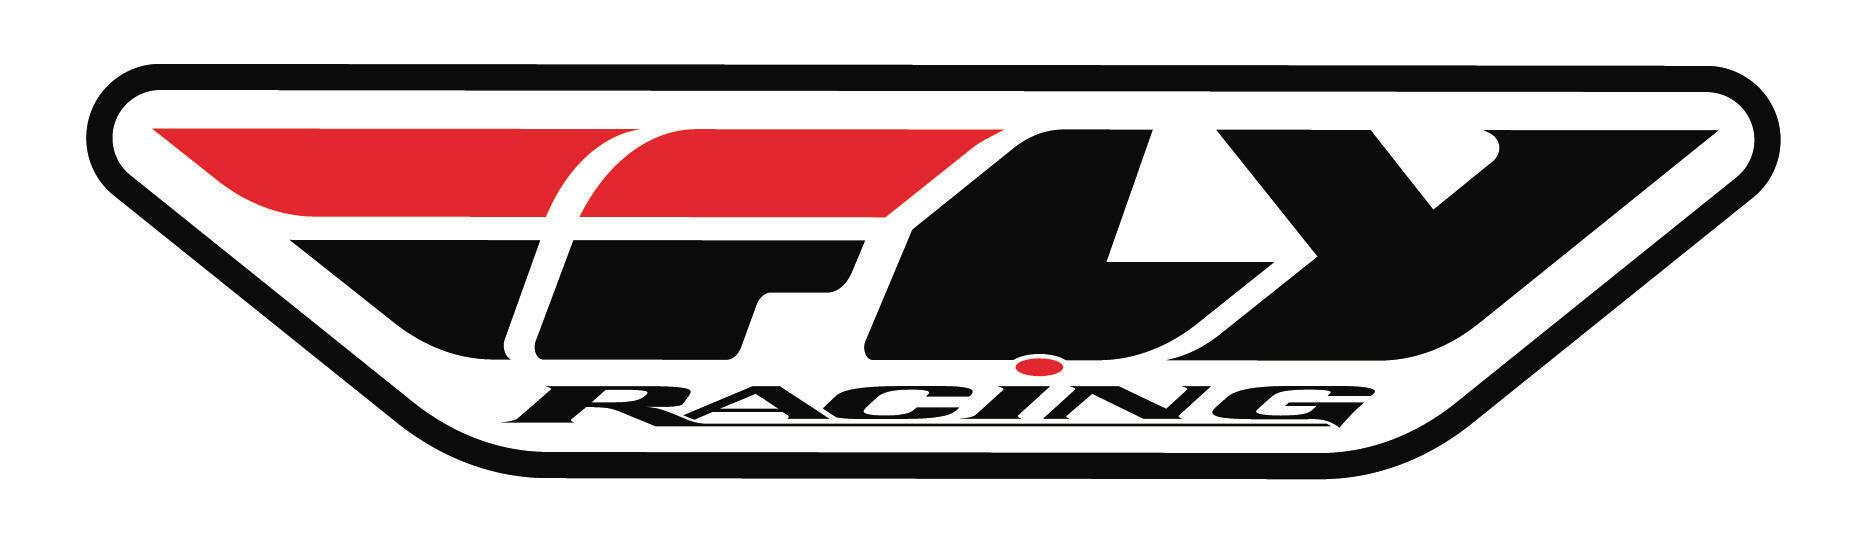 fly_racing_logo.jpg